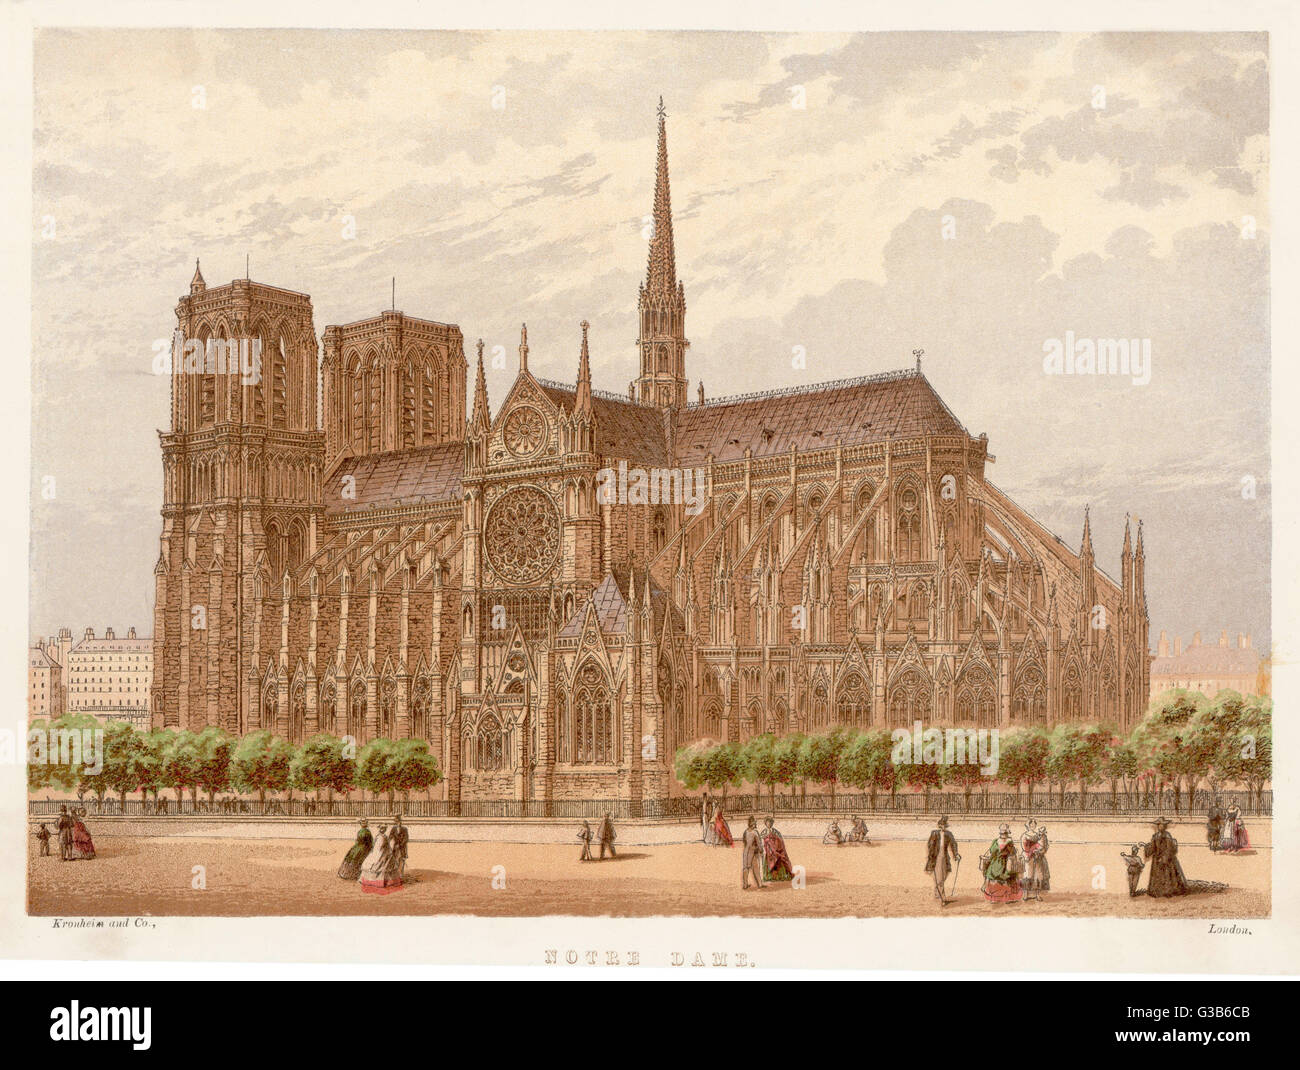 Notre Dame de Paris,  in all its gothic splendour        Date: circa 1870 - Stock Image